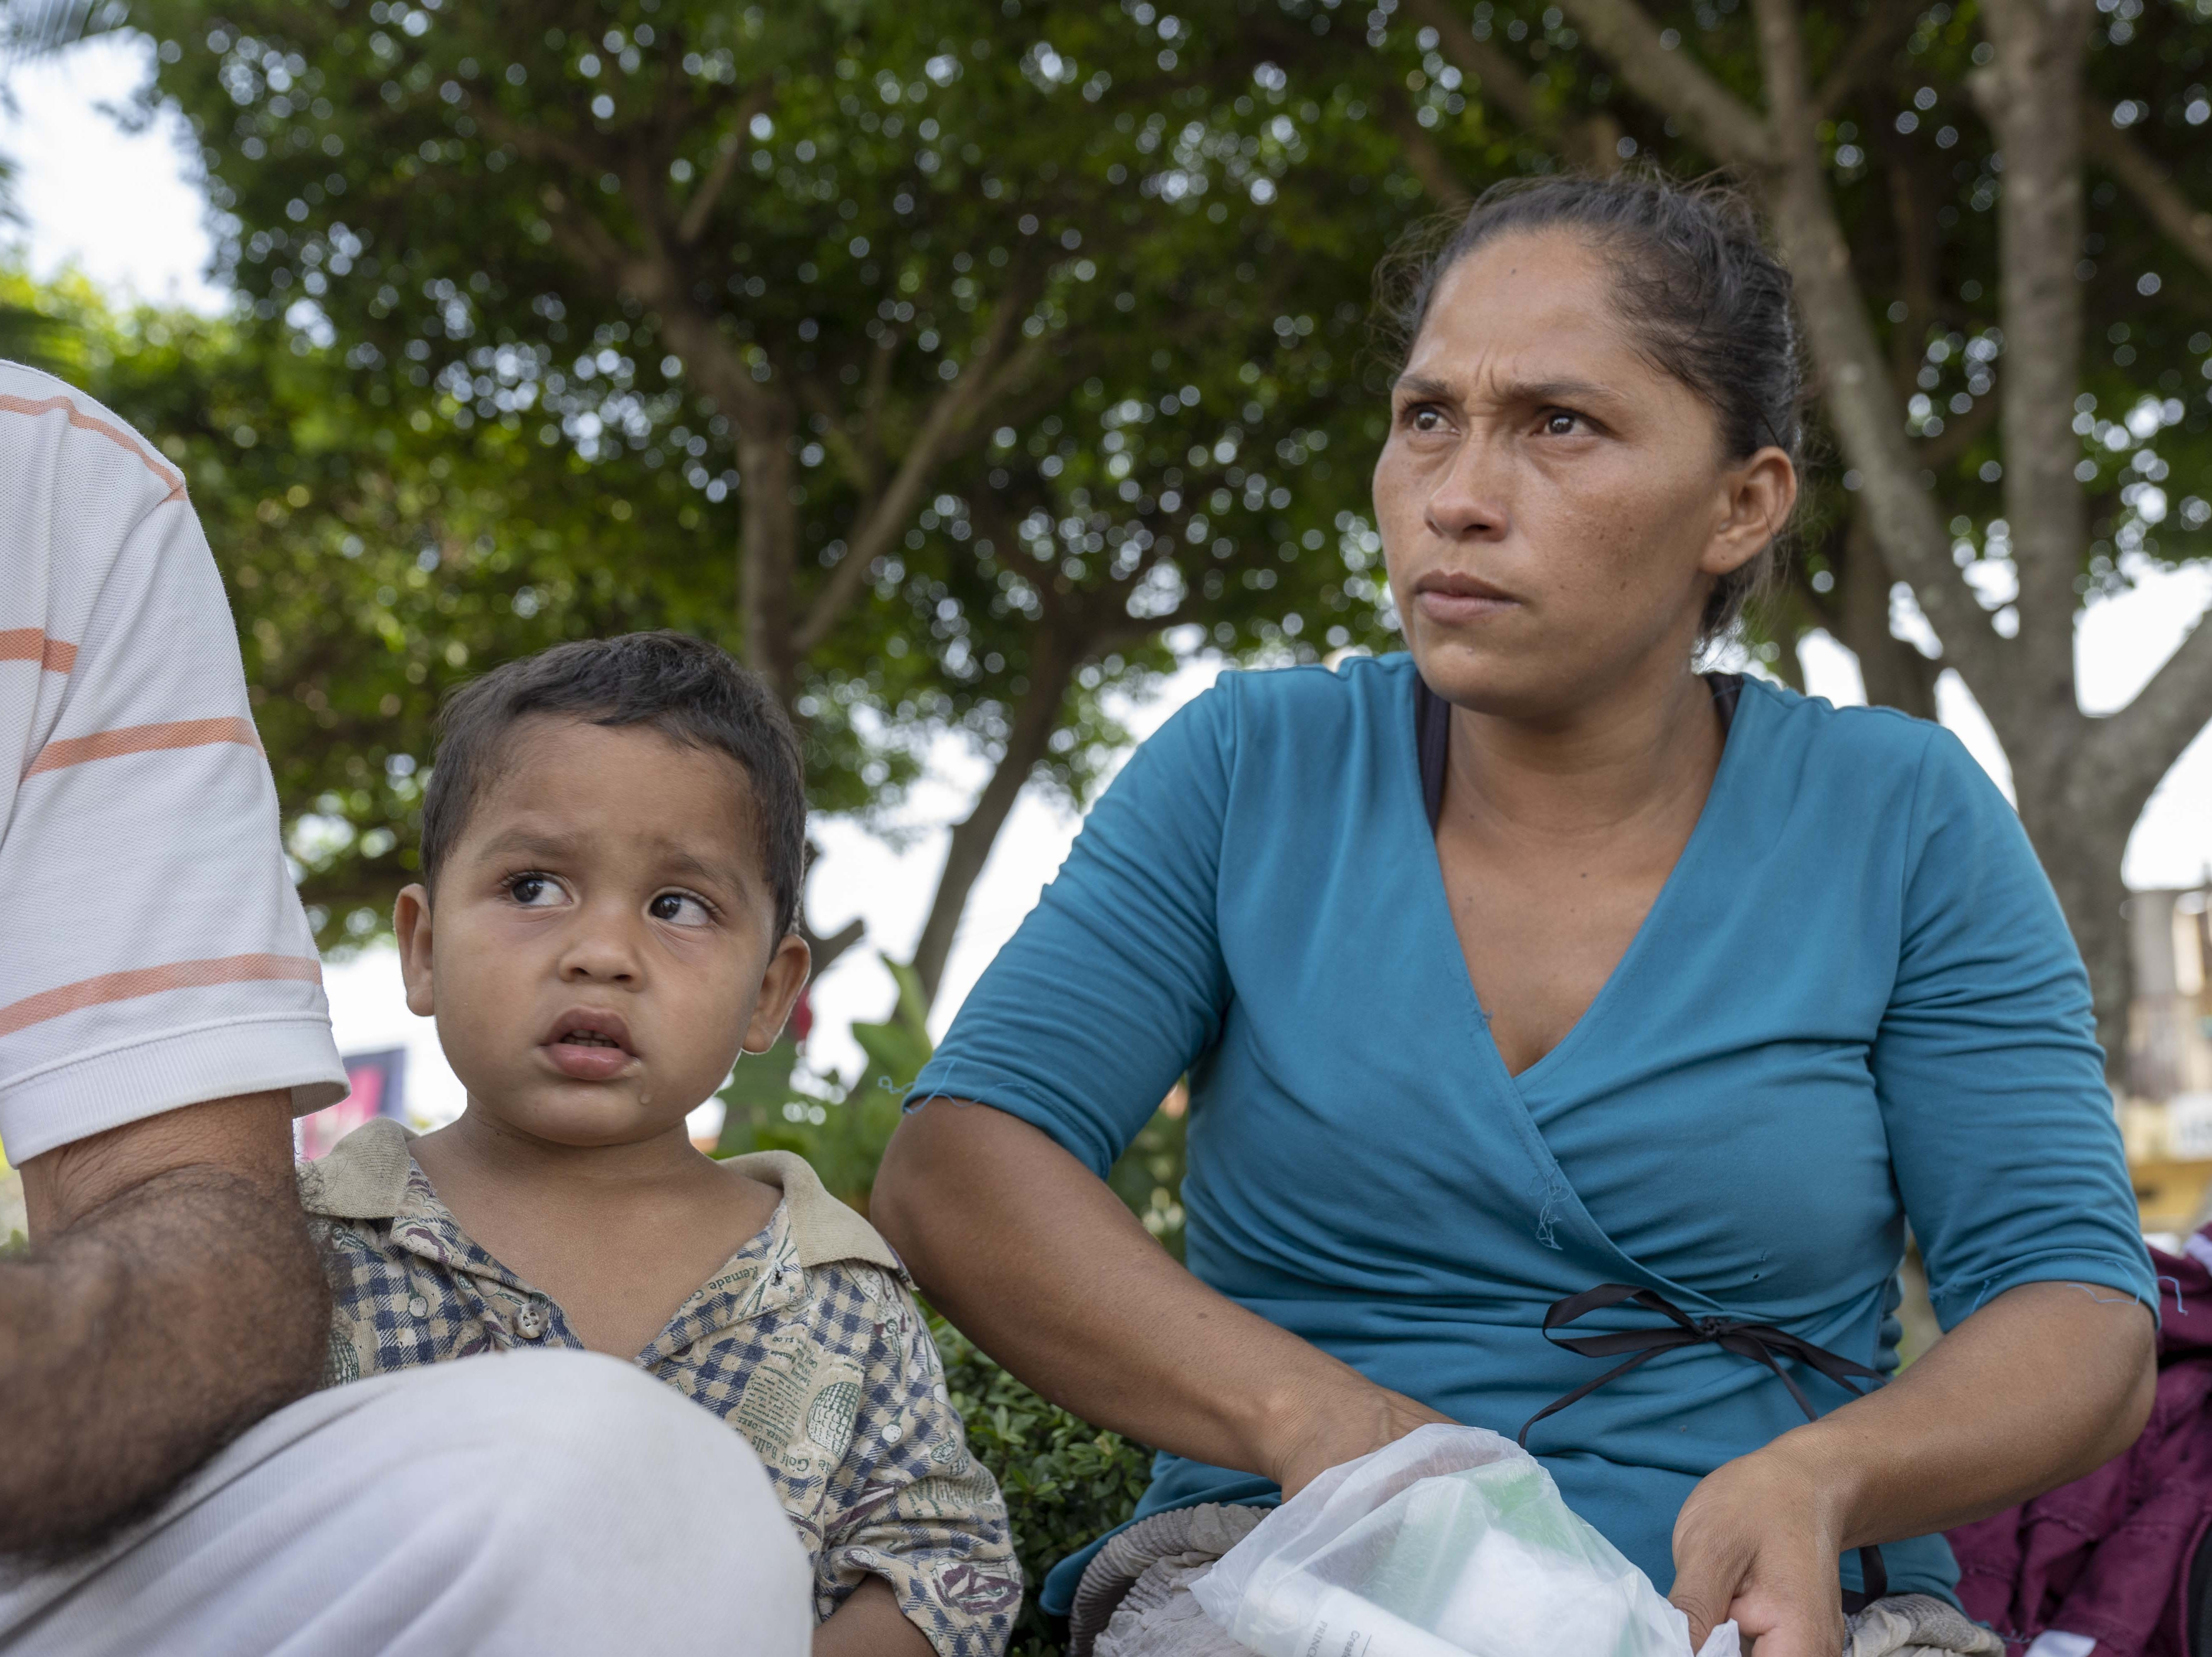 Migrants from Honduras and El Salvador gather near a park in Tecun Uman, Guatemala.